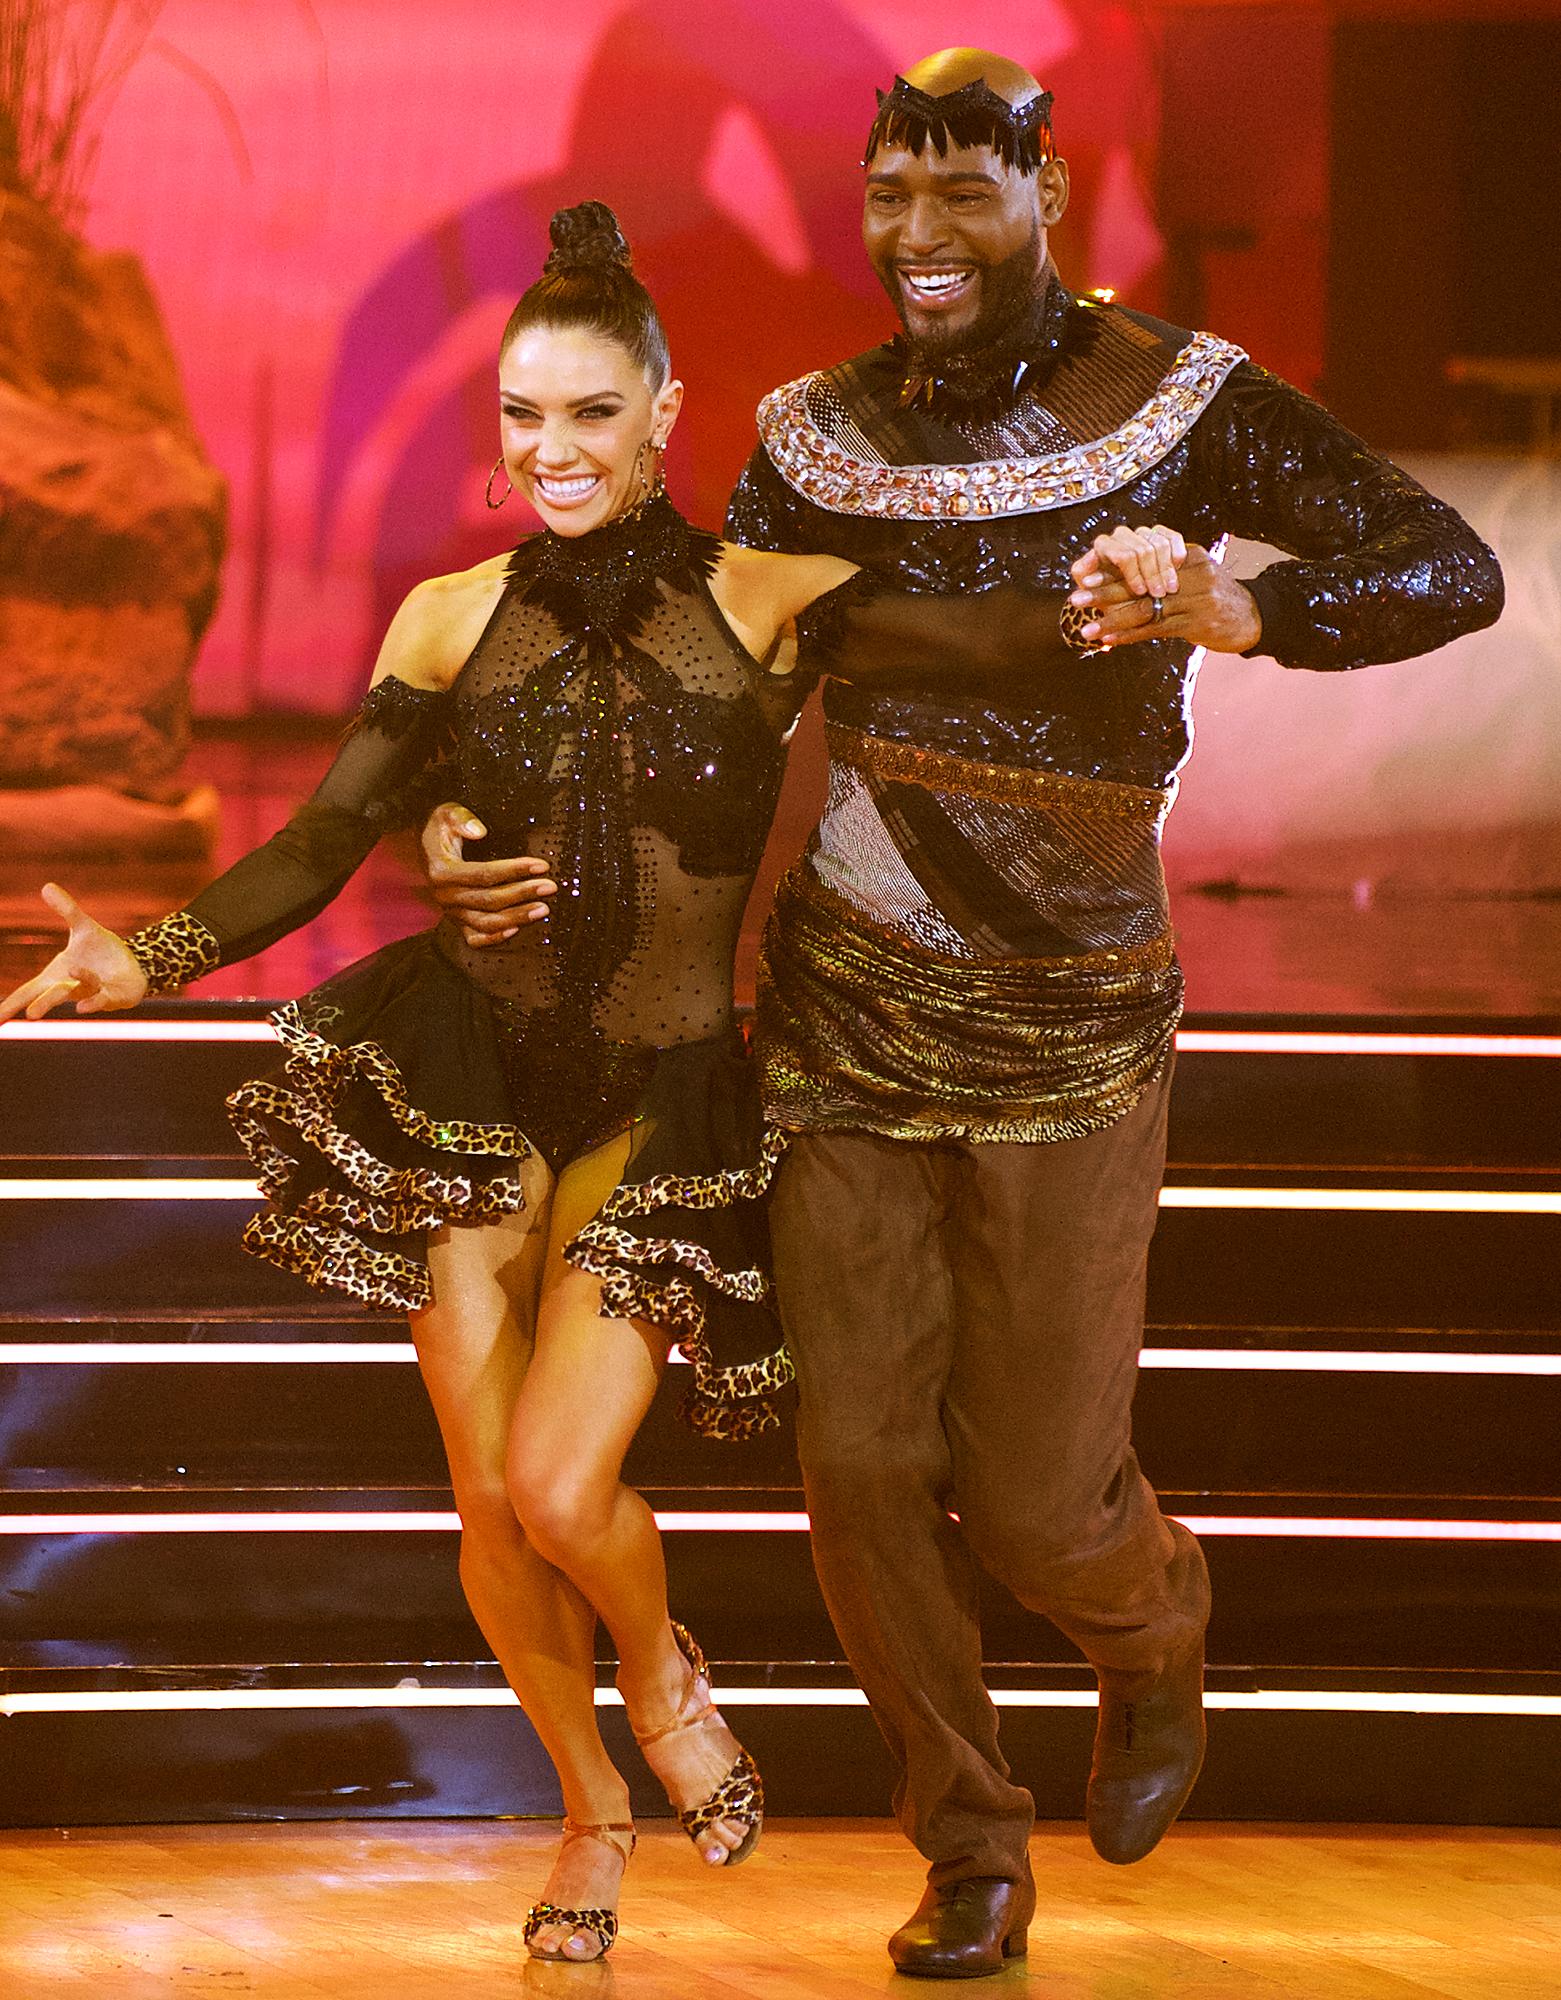 Karamo-Brown-dancing-with-the-stars